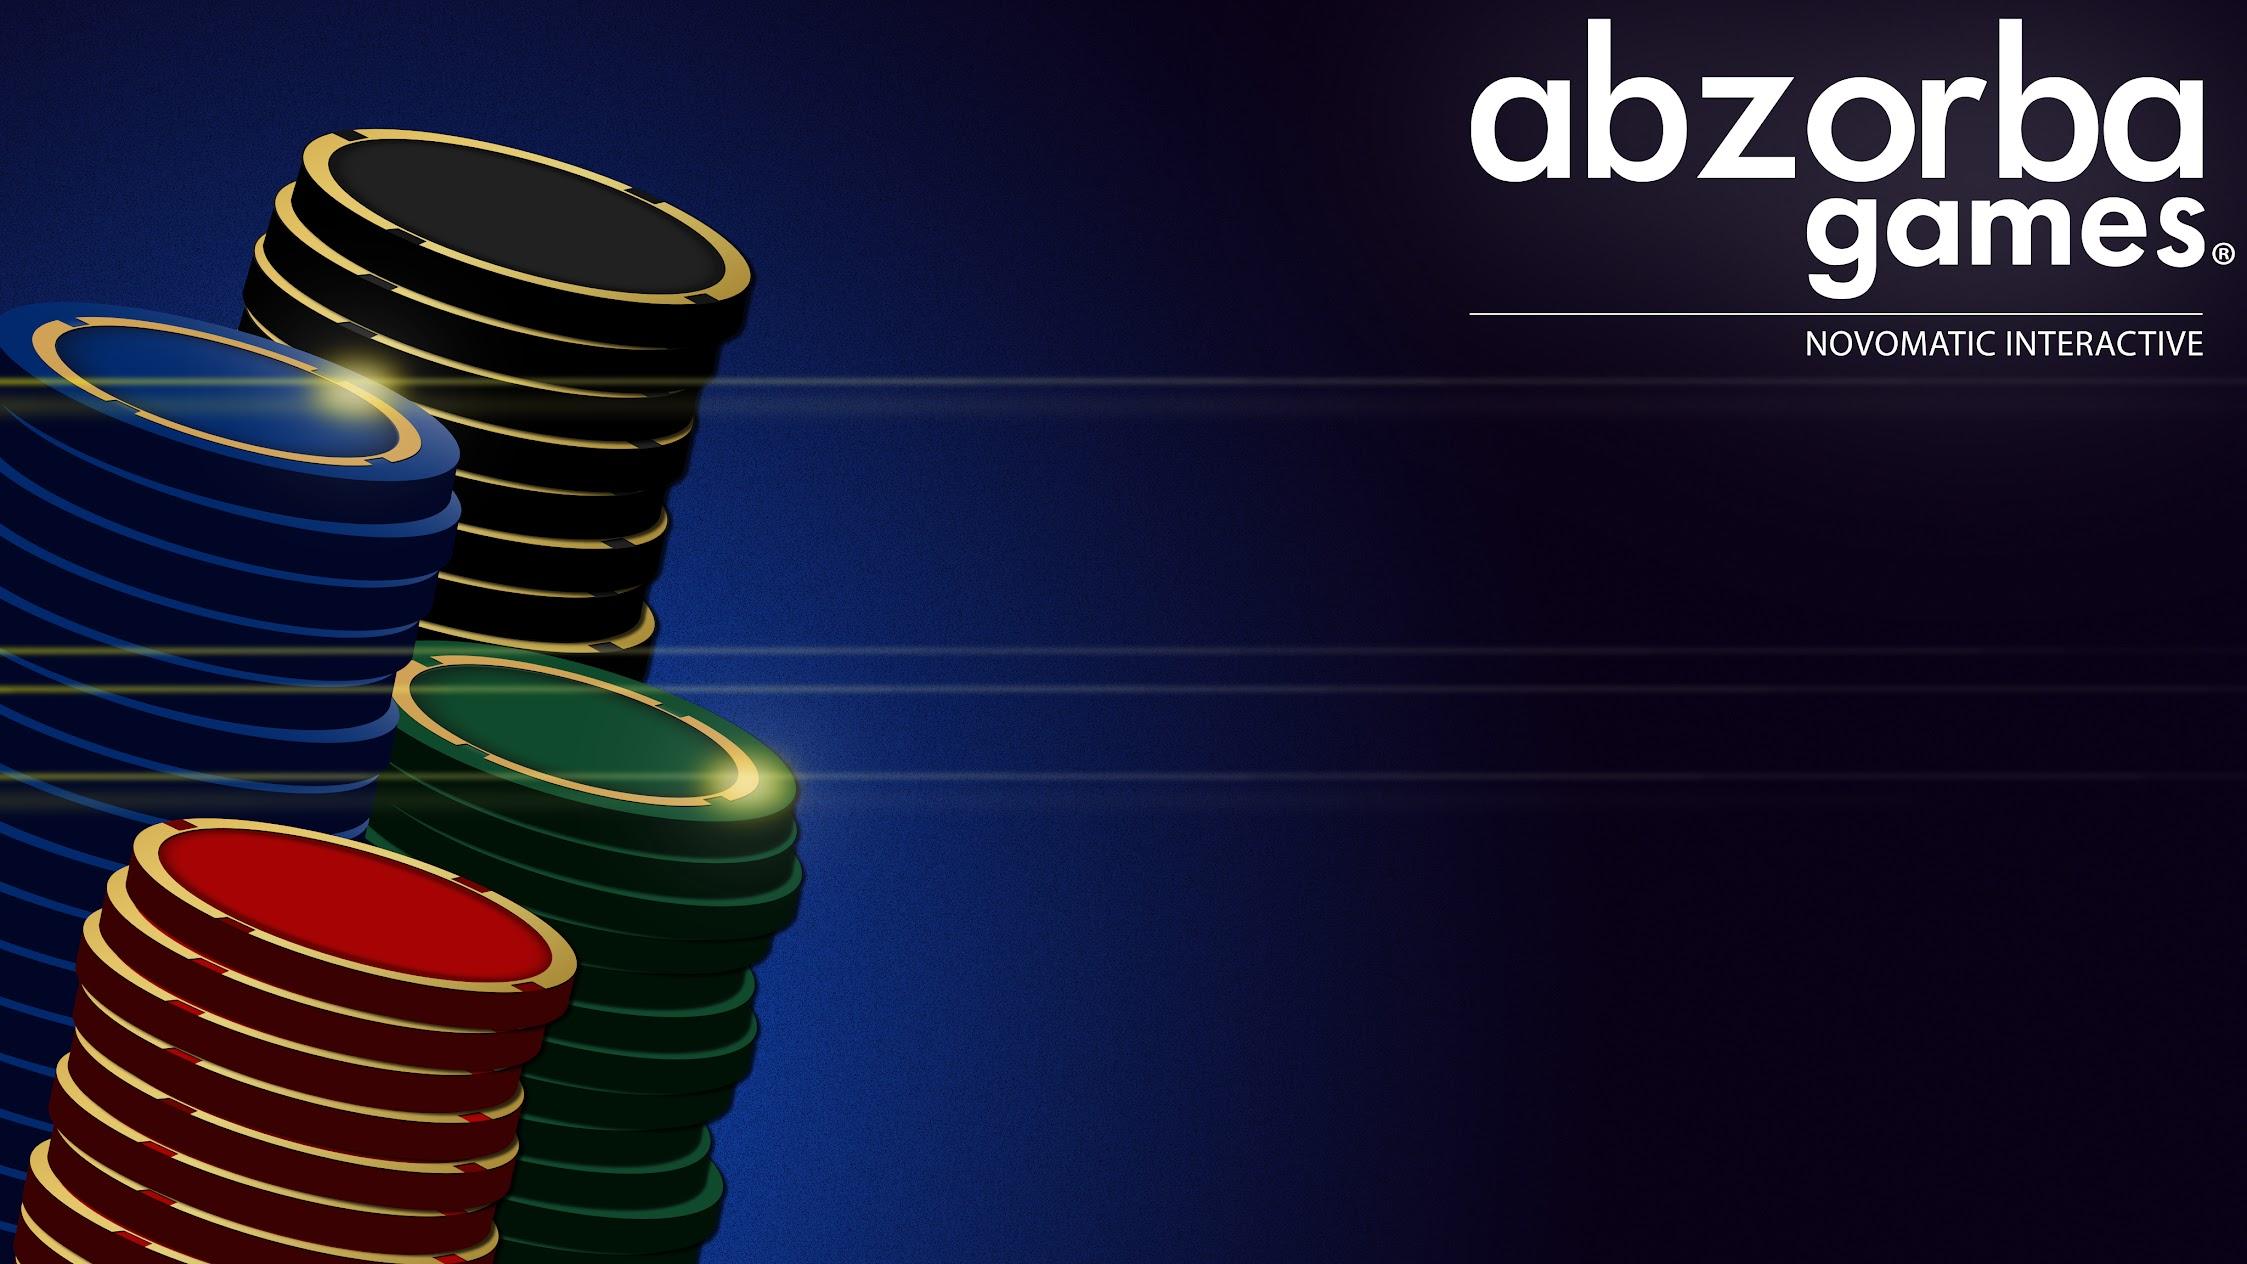 AbZorba Games BetriebsgmbH